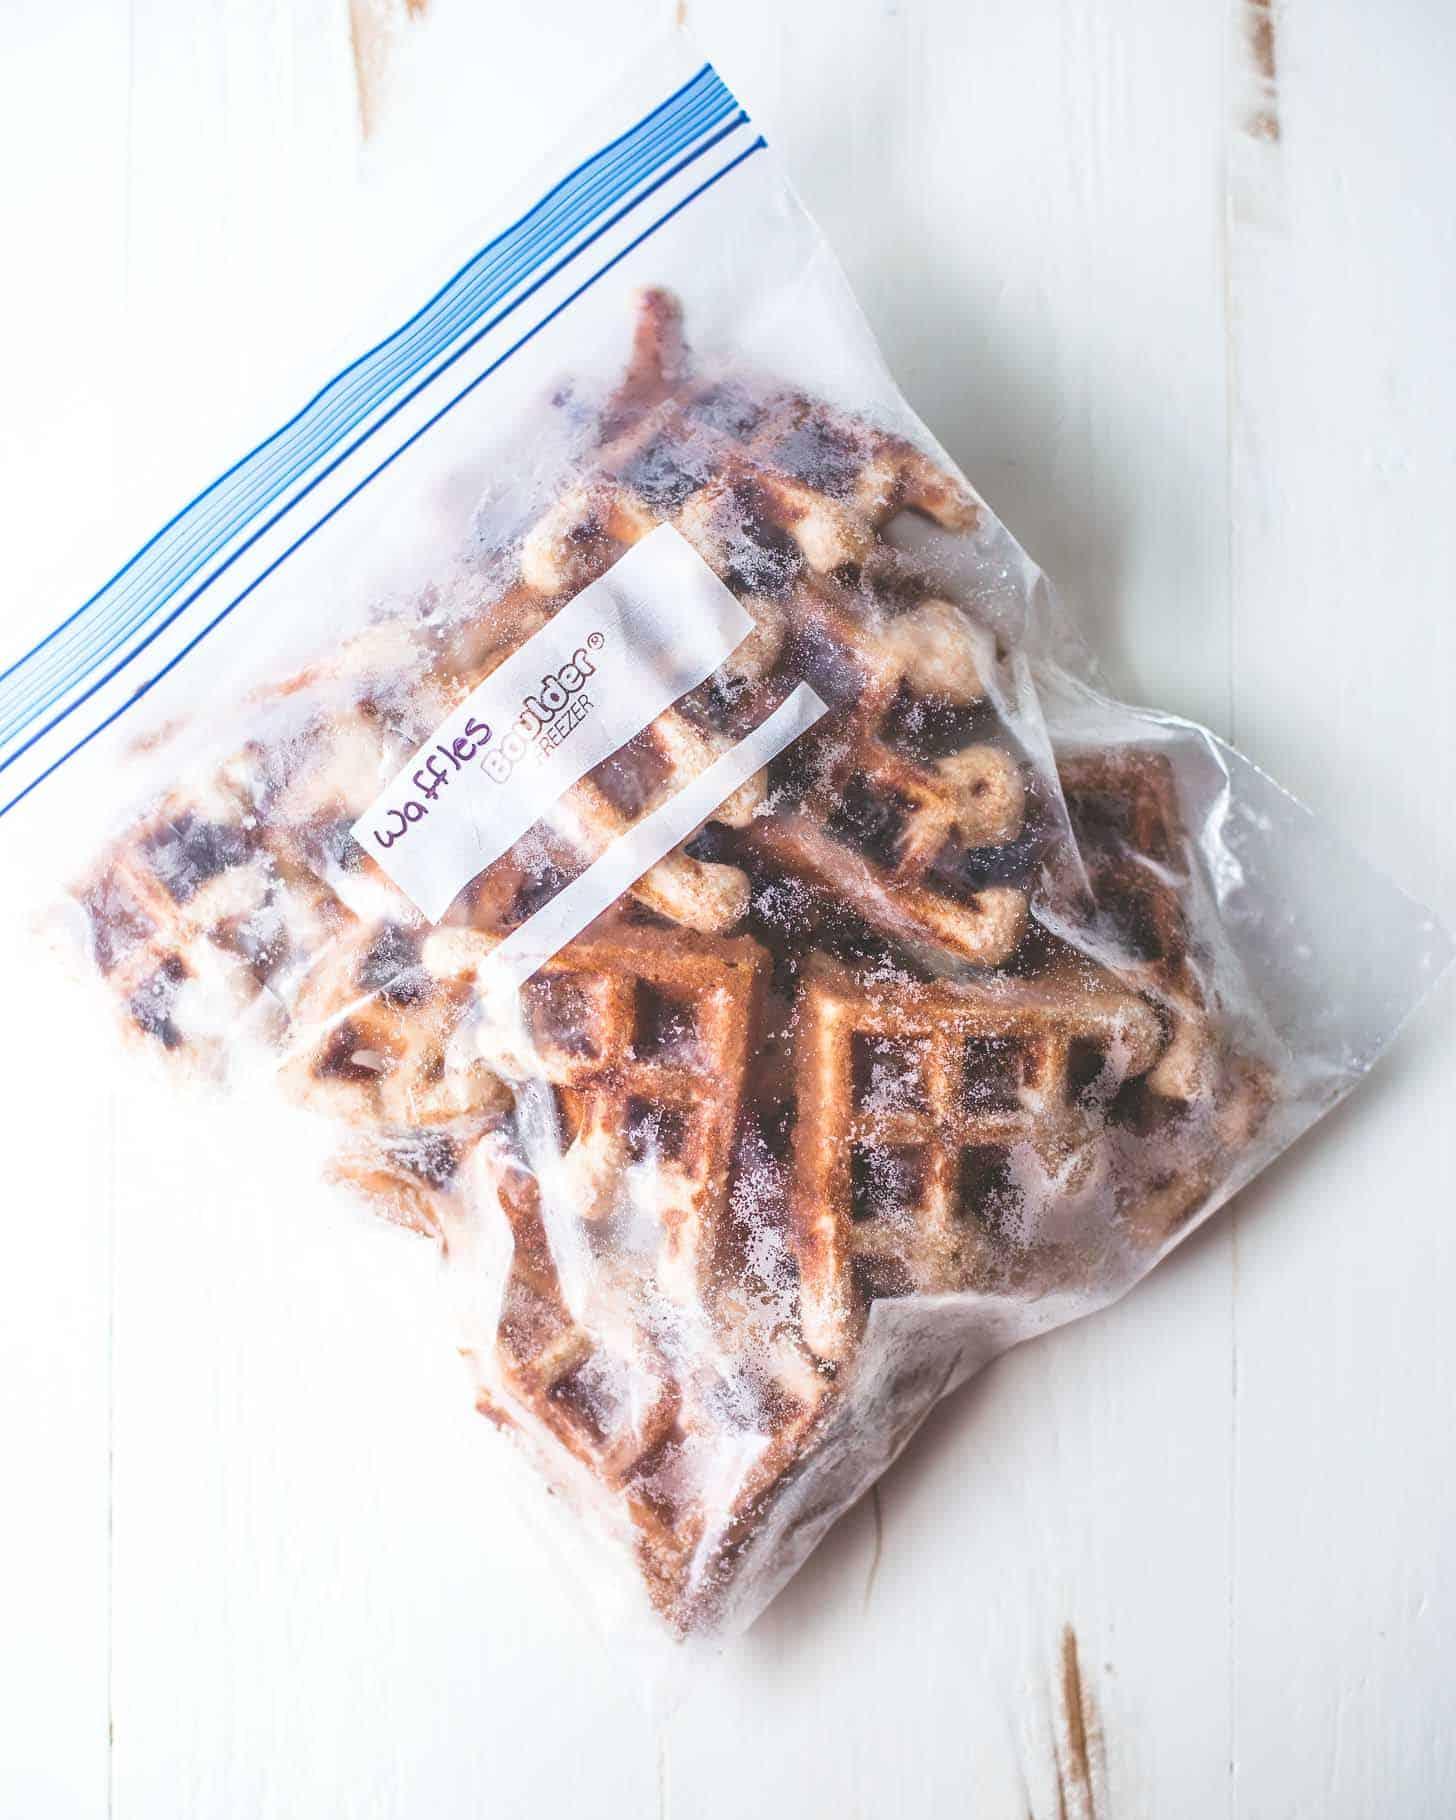 waffles in a freezer bag